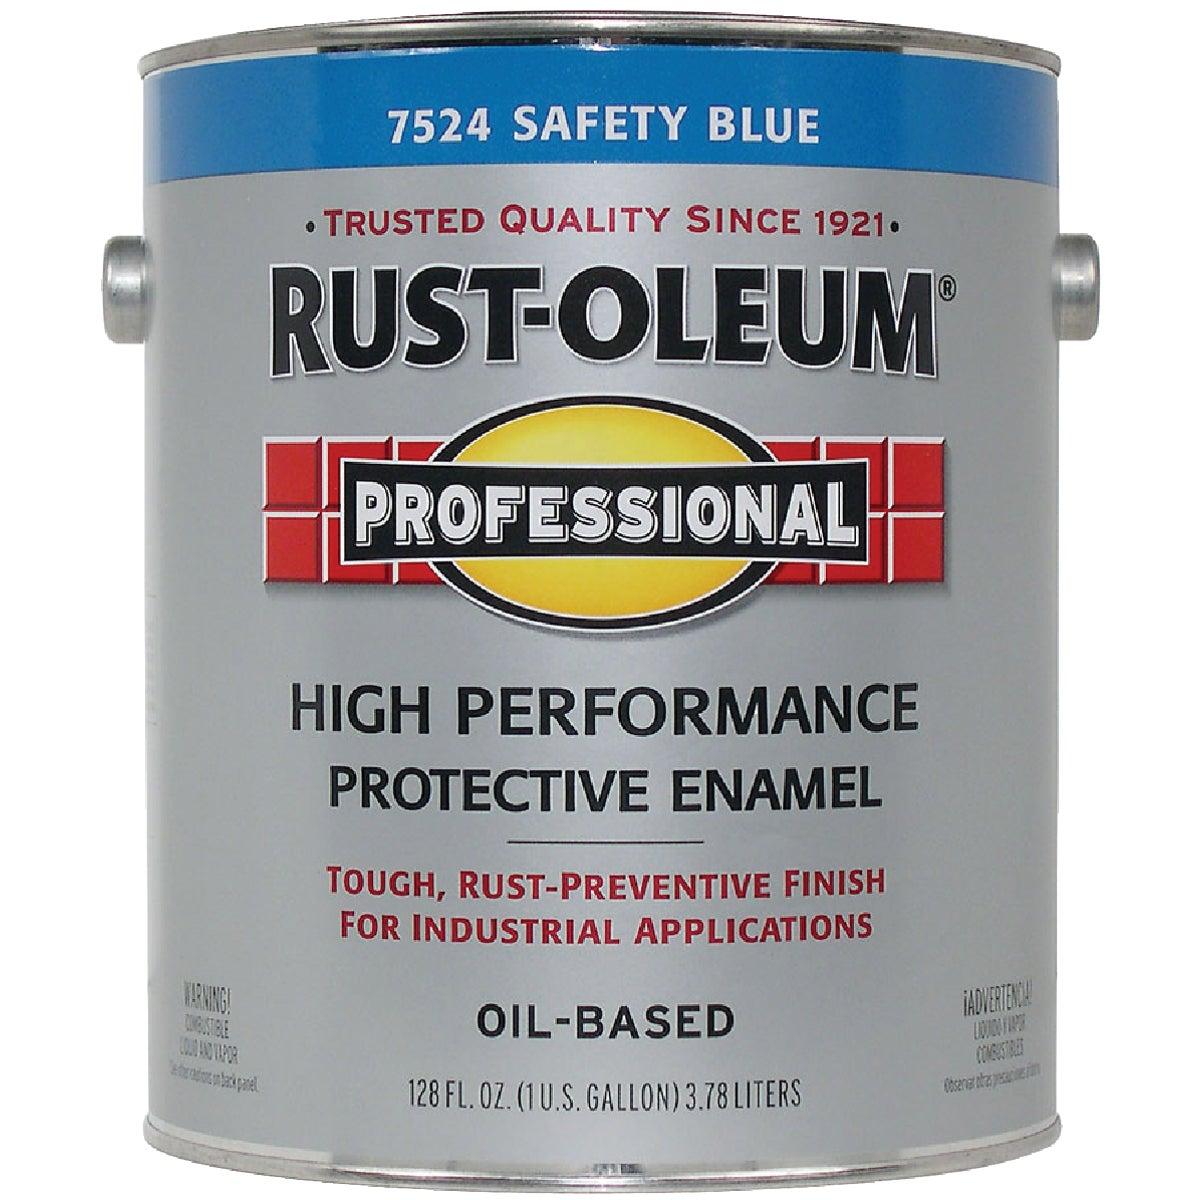 VOC SAFE BLUE PRO ENAMEL - K7725 by Rustoleum